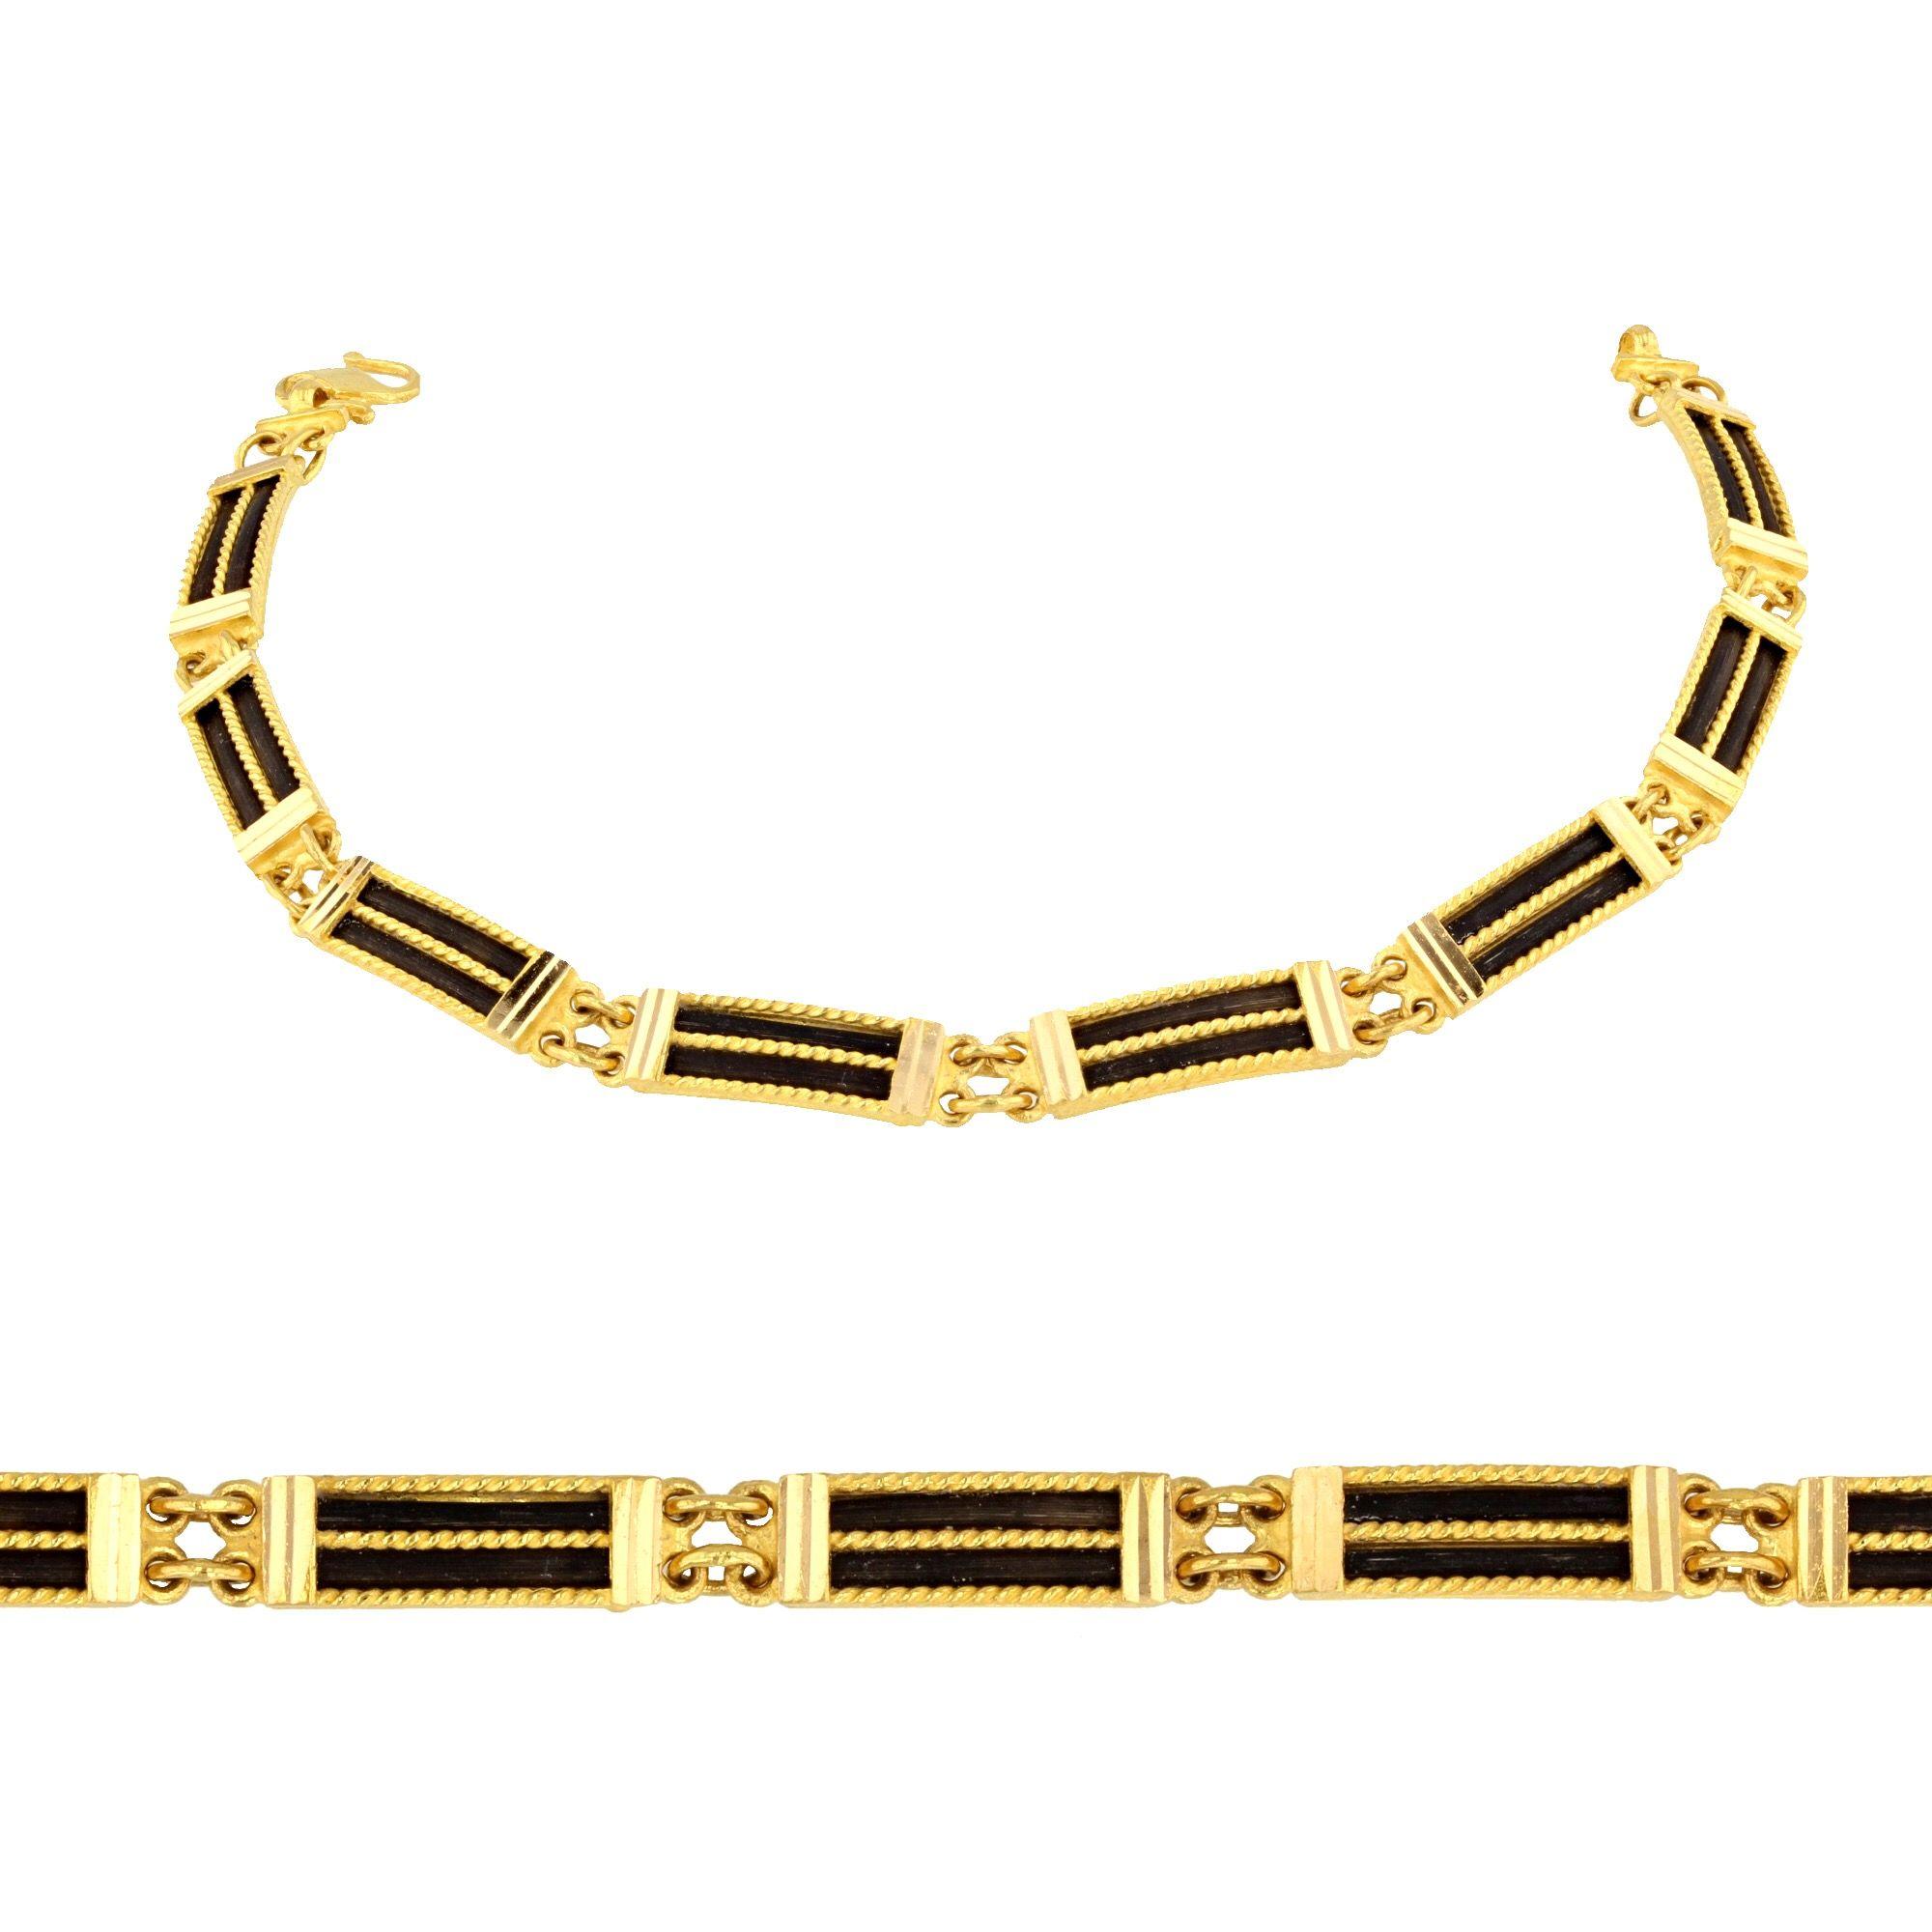 22Carat Yellow Gold and Elephant Hair Unisex Bracelet www ...